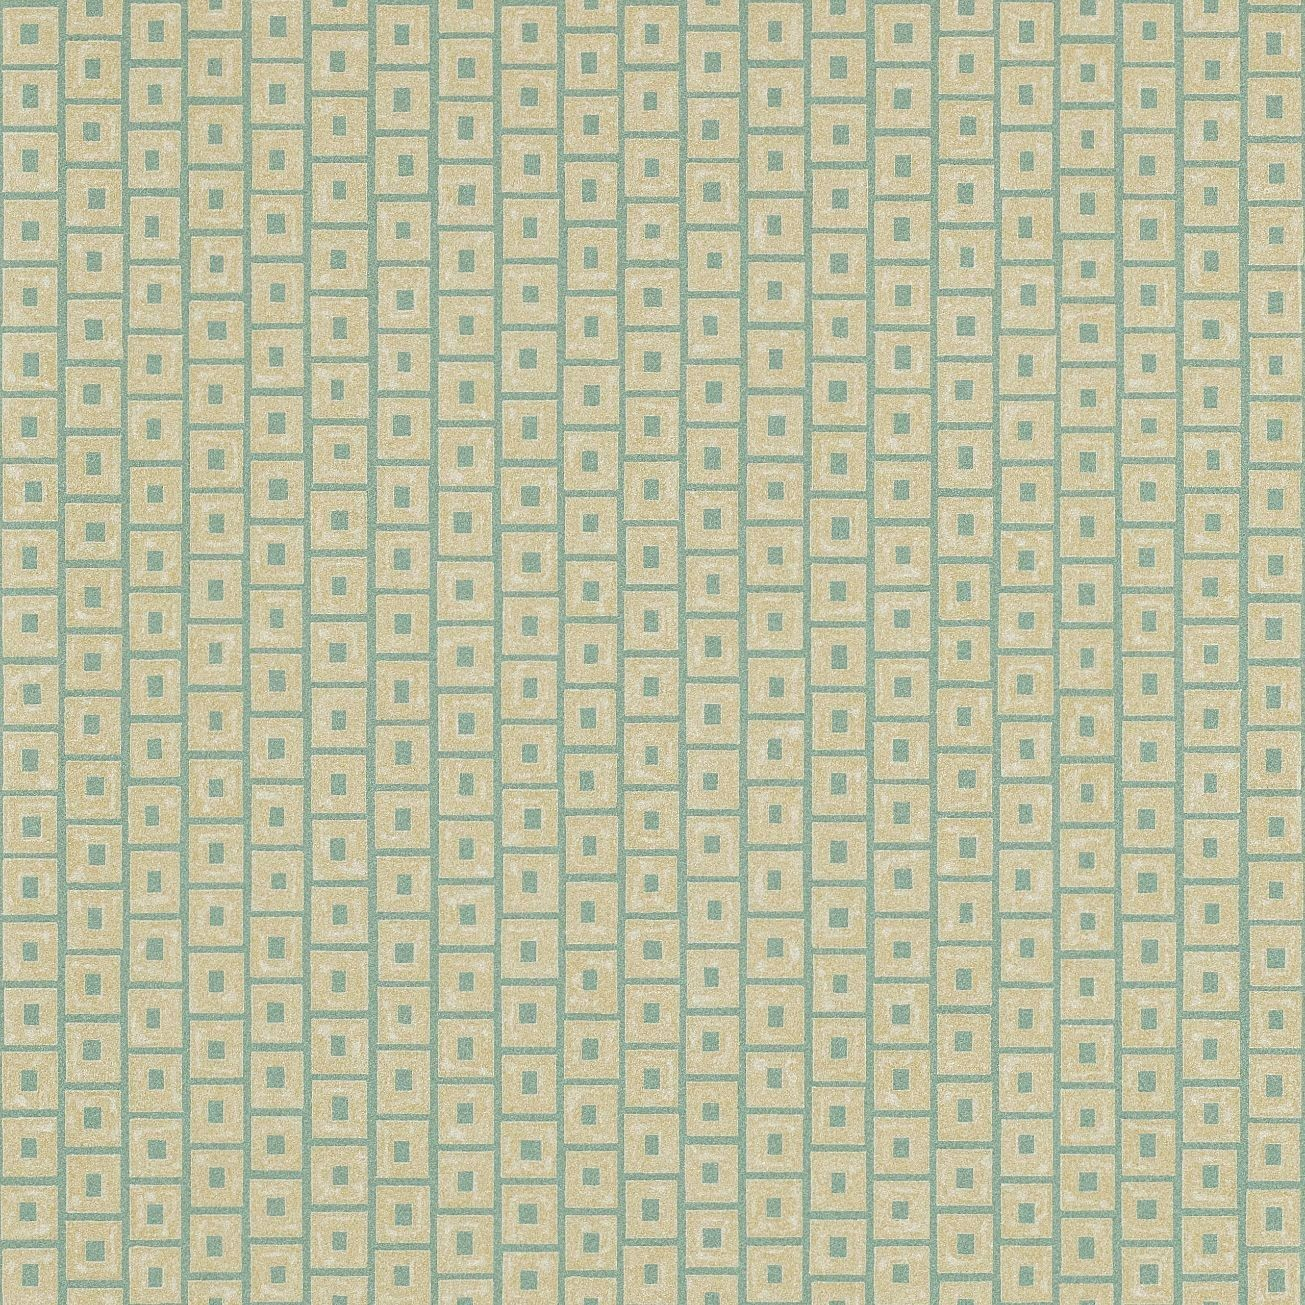 Blue Beige   213032   Talos   Aegean   Vinyl   Sanderson Wallpaper 1305x1305